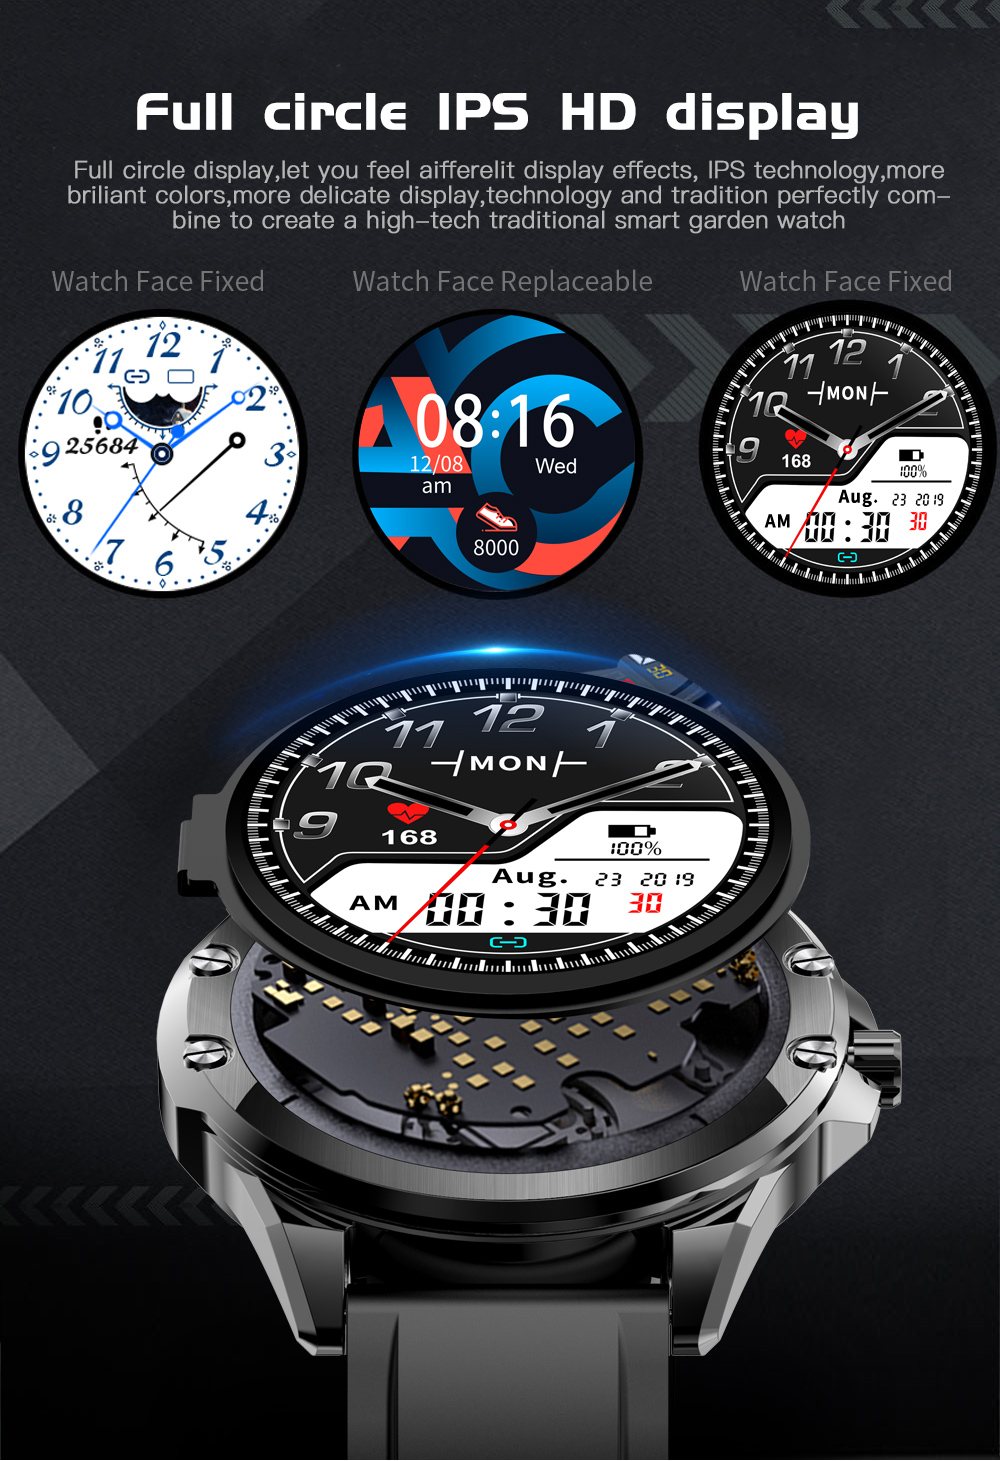 H162519fa471b433d8004bbf43bc83ab4F CYUC S11 Smart watch men HD Full round Screen IP68 Waterproof